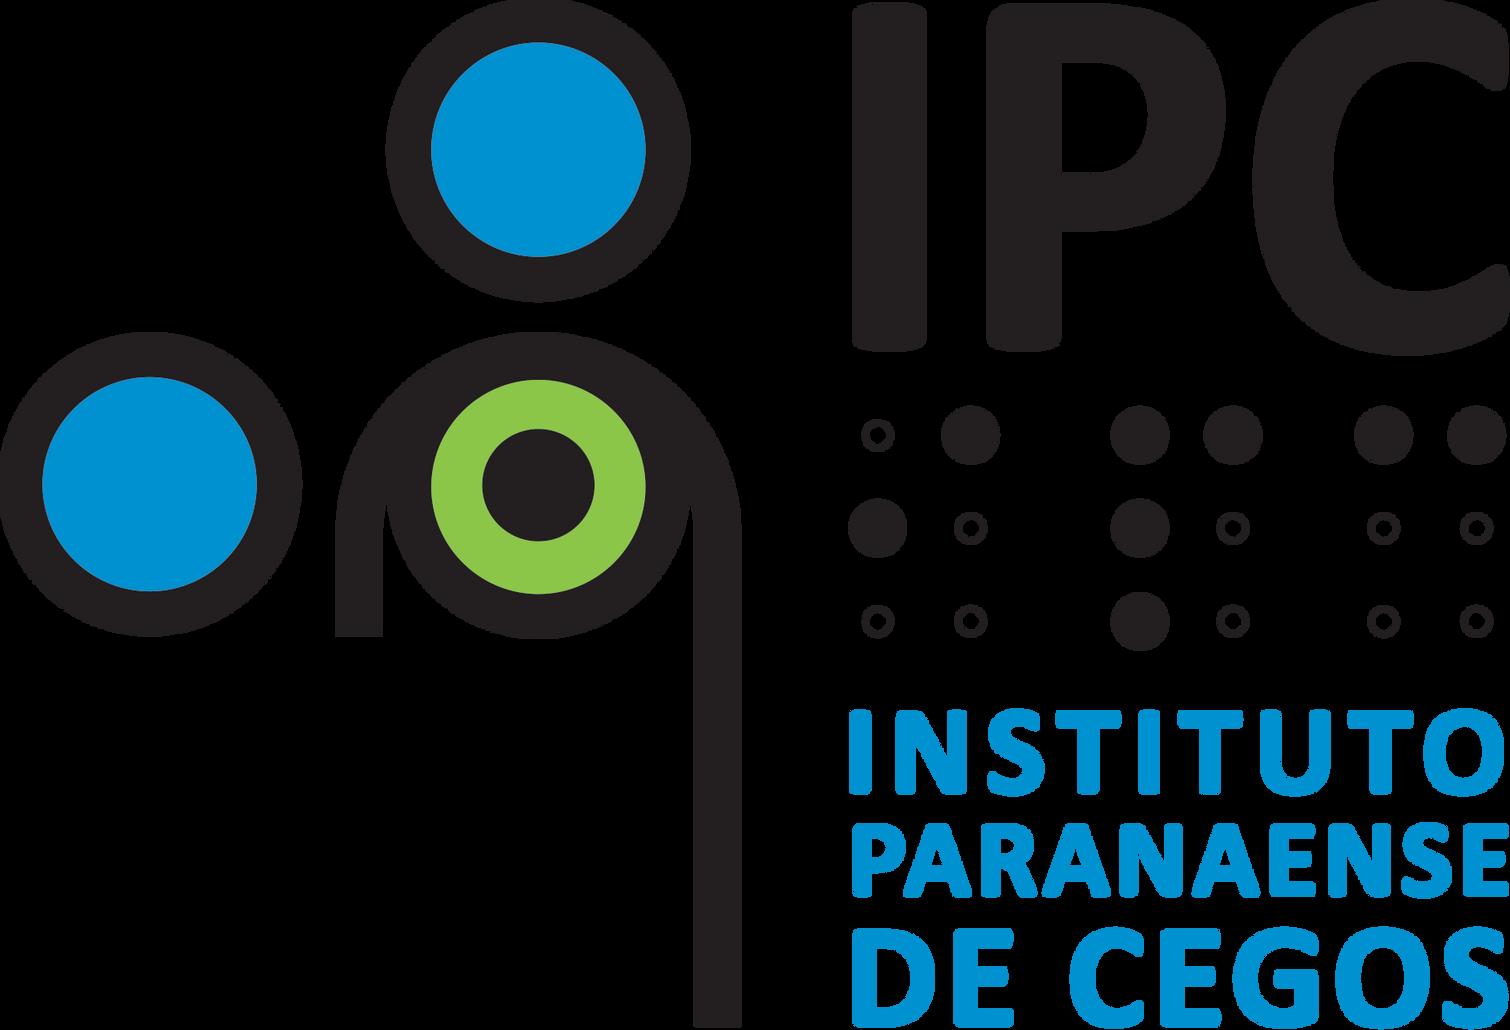 Logotipo do Instituto Paranaense de Cegos.